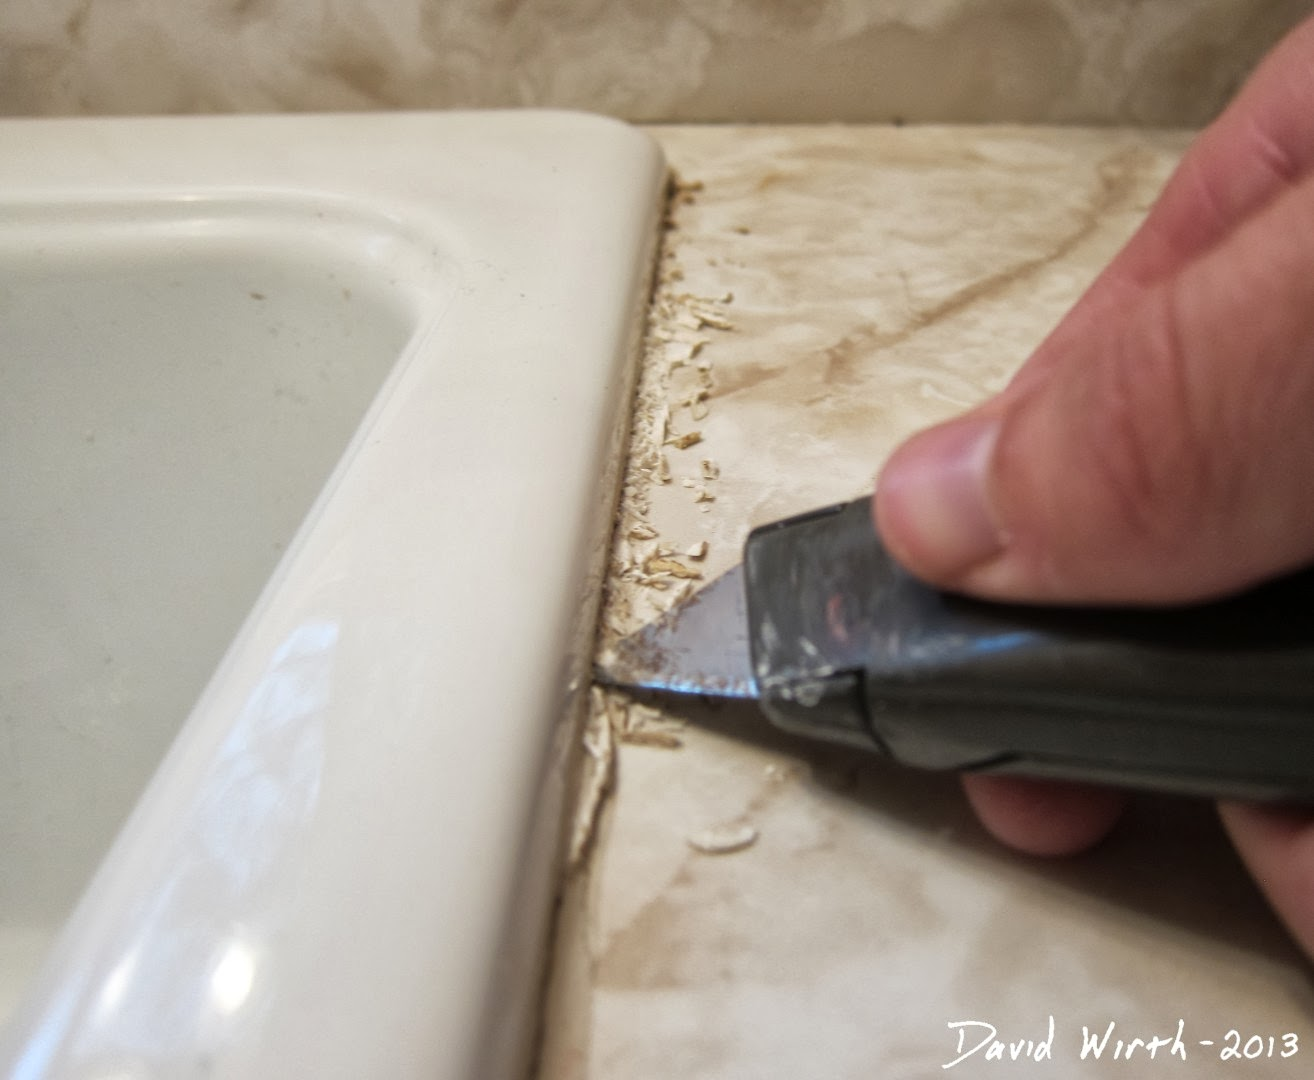 How To Remove Cracked Caulk, Sink, Razor Blade, Utility Knife